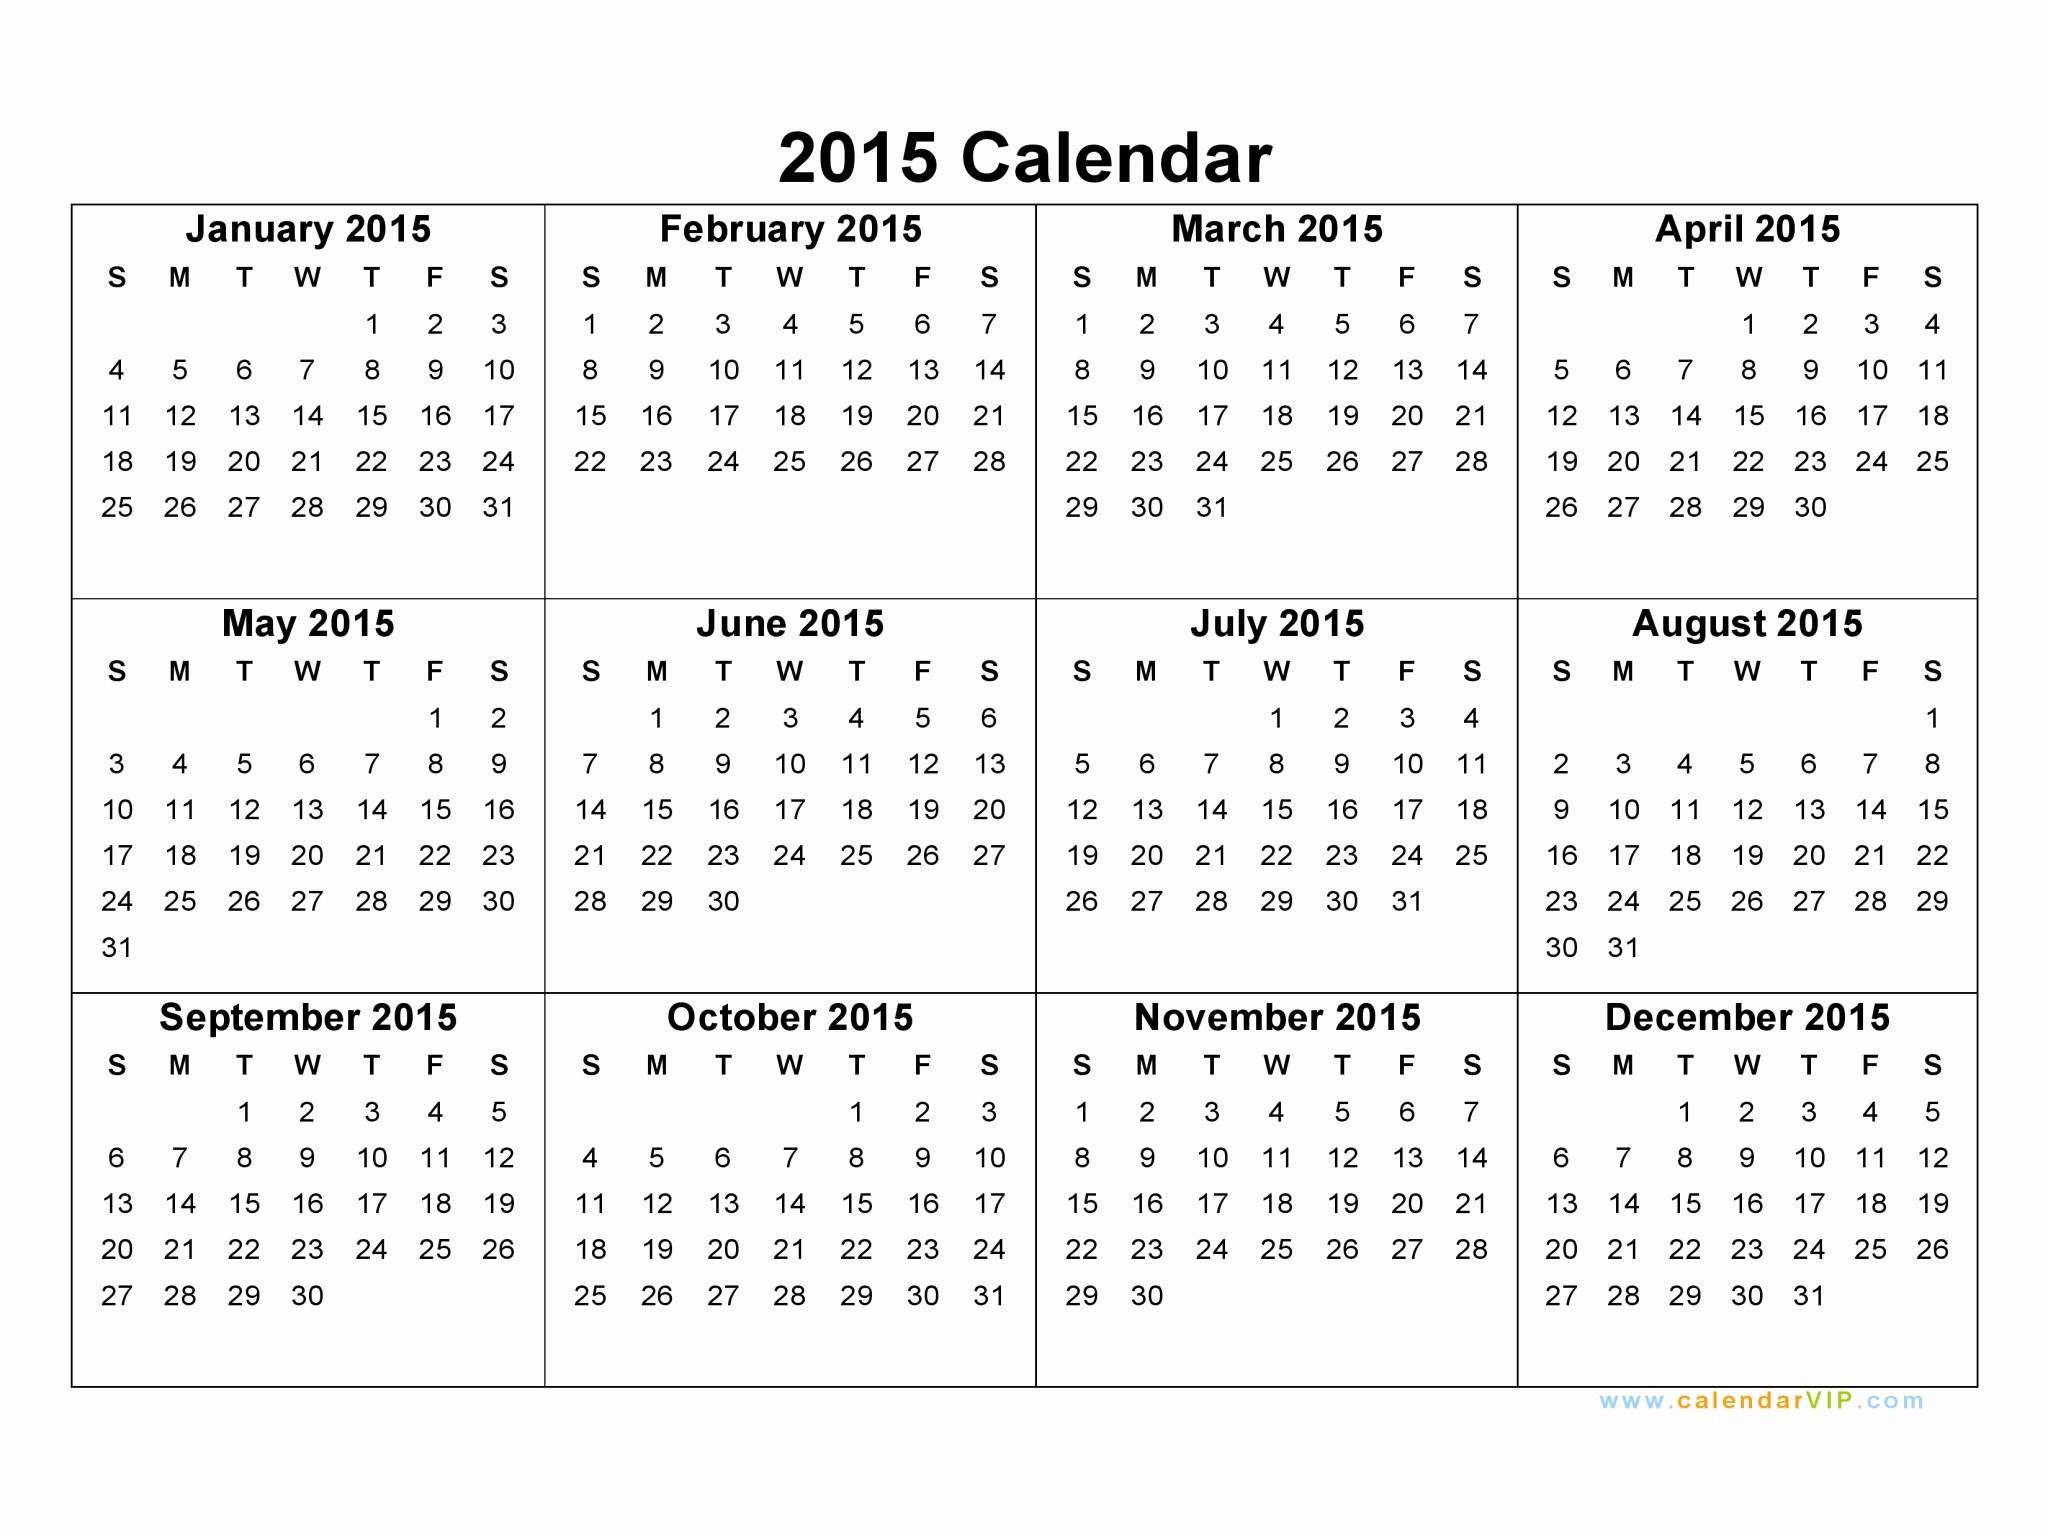 Free Monthly Calendar Templates 2015 Fresh 2015 Calendar Blank Printable Calendar Template In Pdf